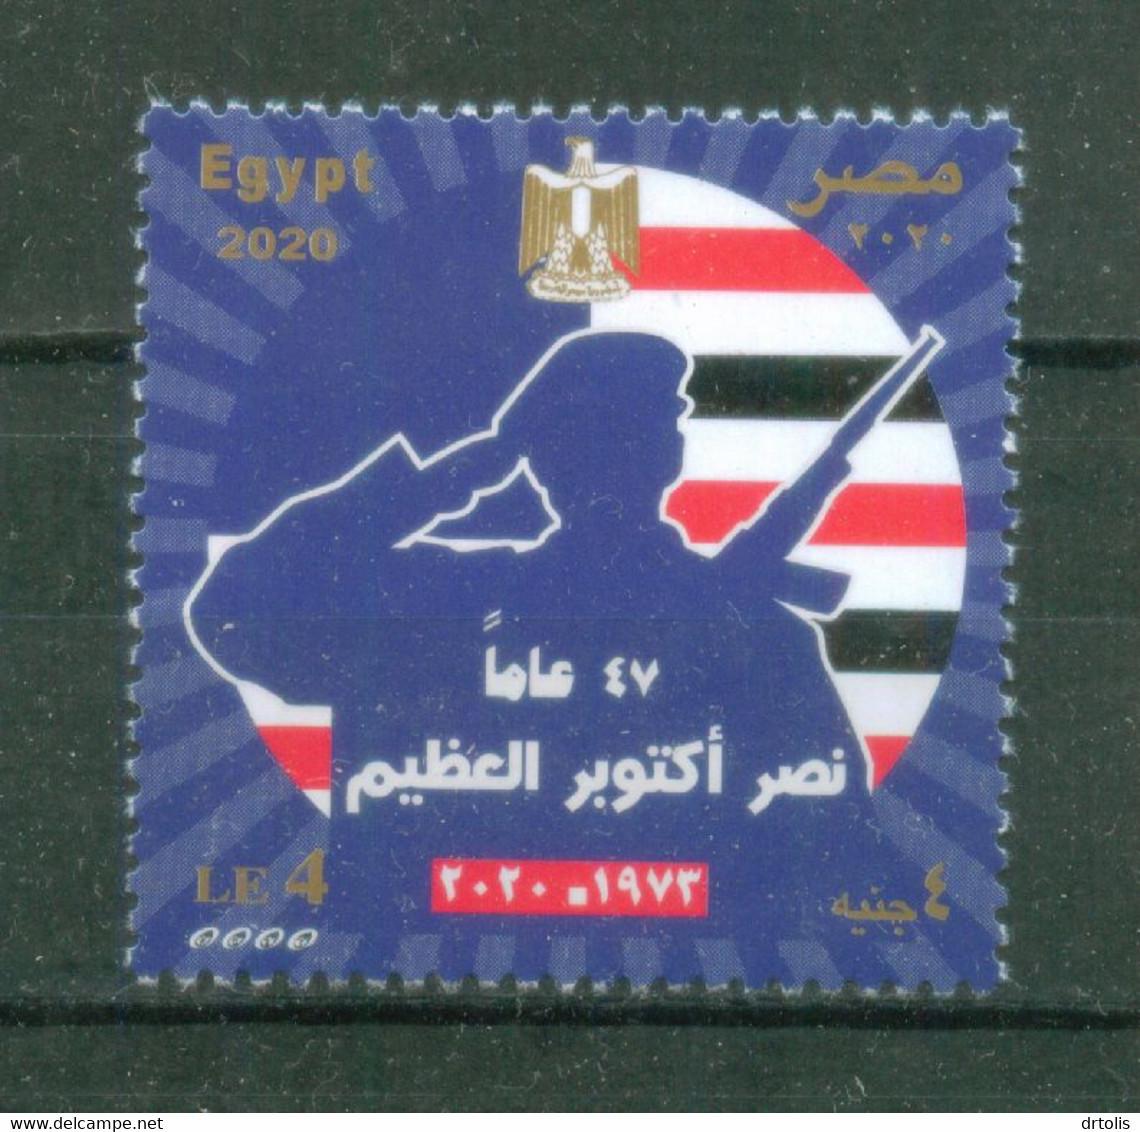 EGYPT / ISRAEL / 2020 / 6TH OCTOBER WAR / YOM KIPPUR / FLAG / SOLDIER / GUN / EAGLE EMBLEM / MNH / VF - Nuovi